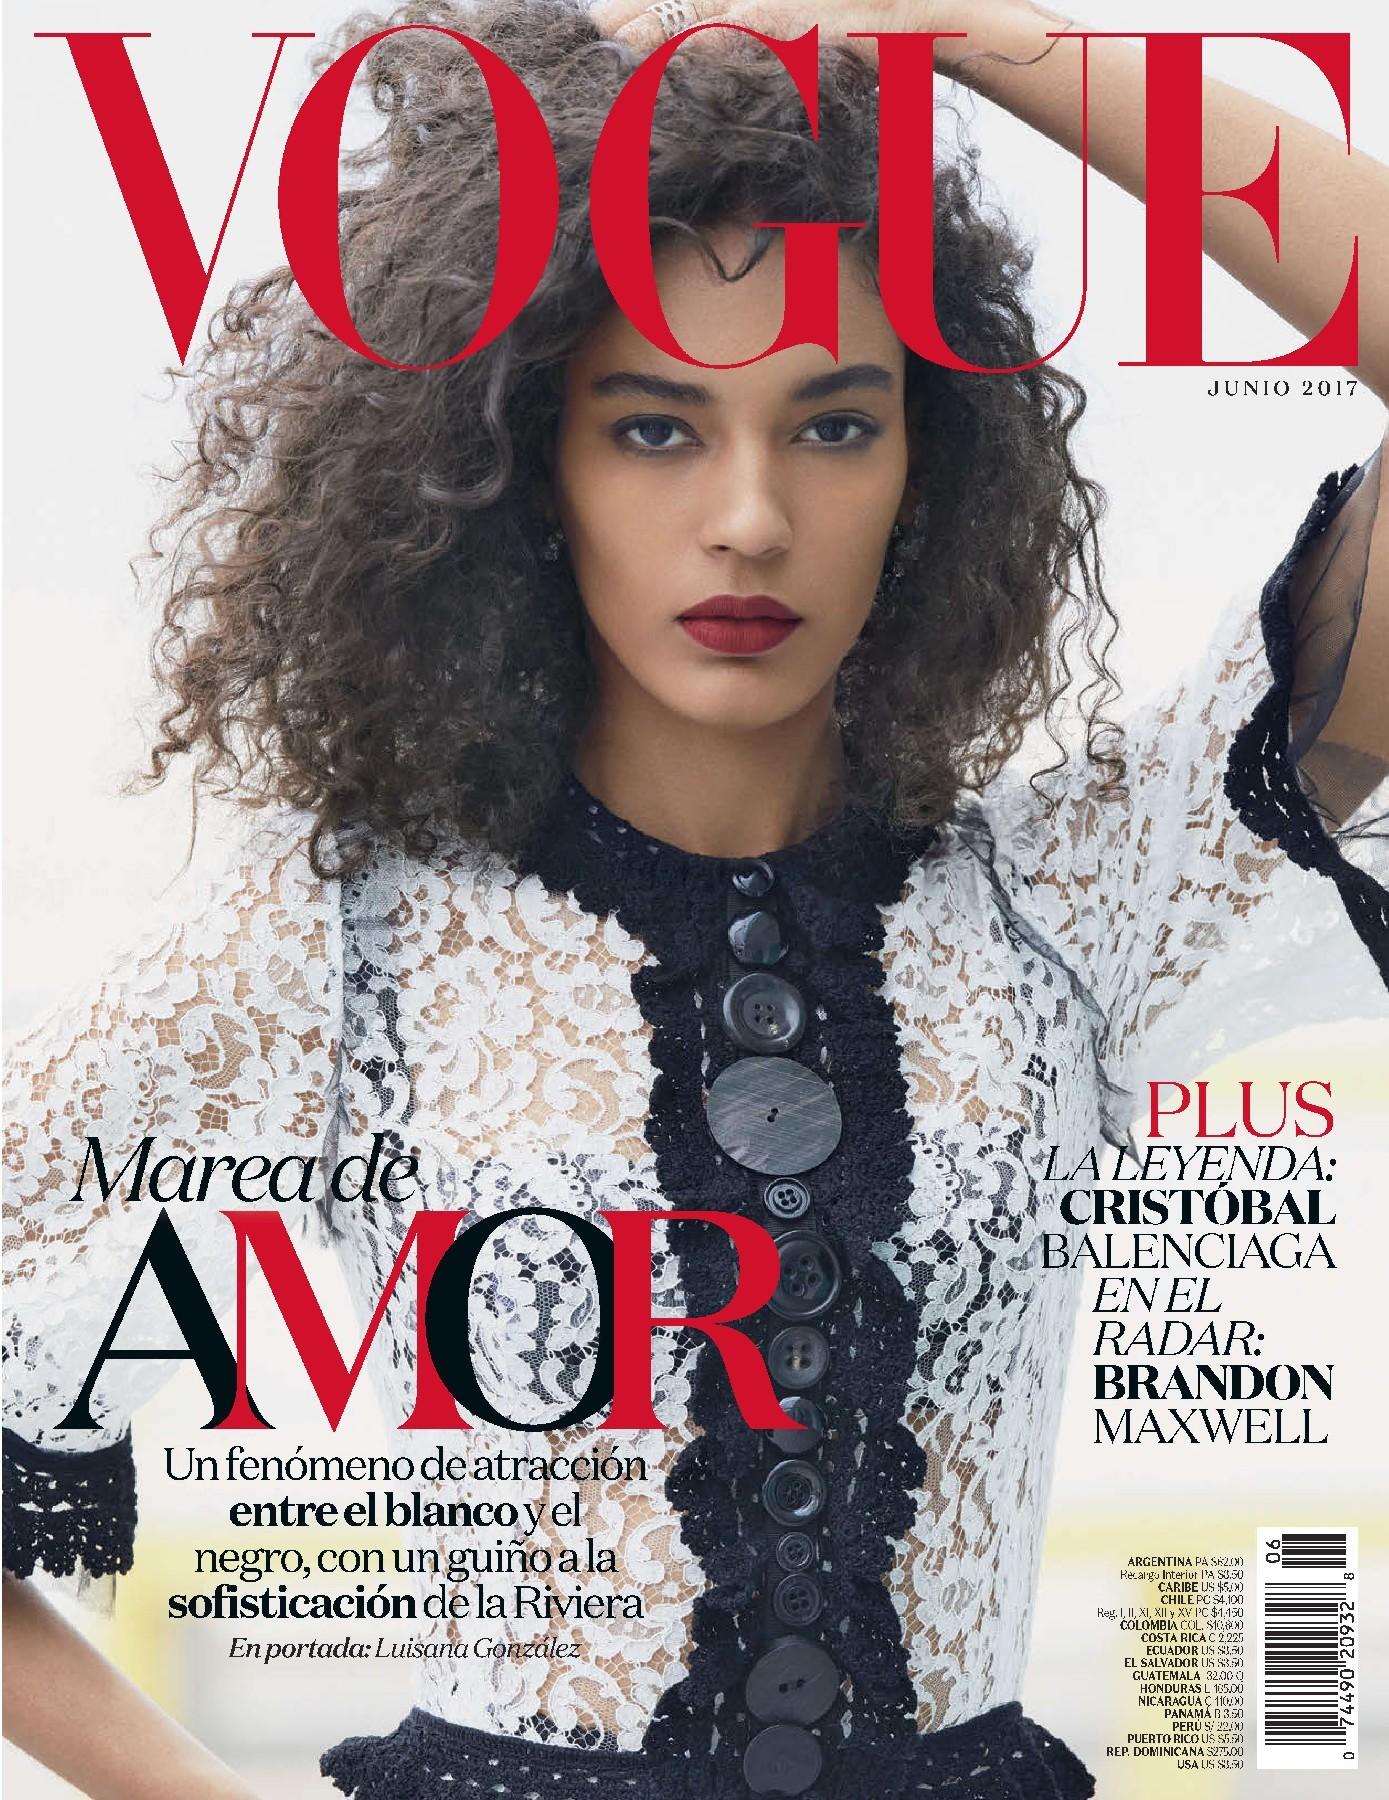 Vogue Latin America Jun 2017